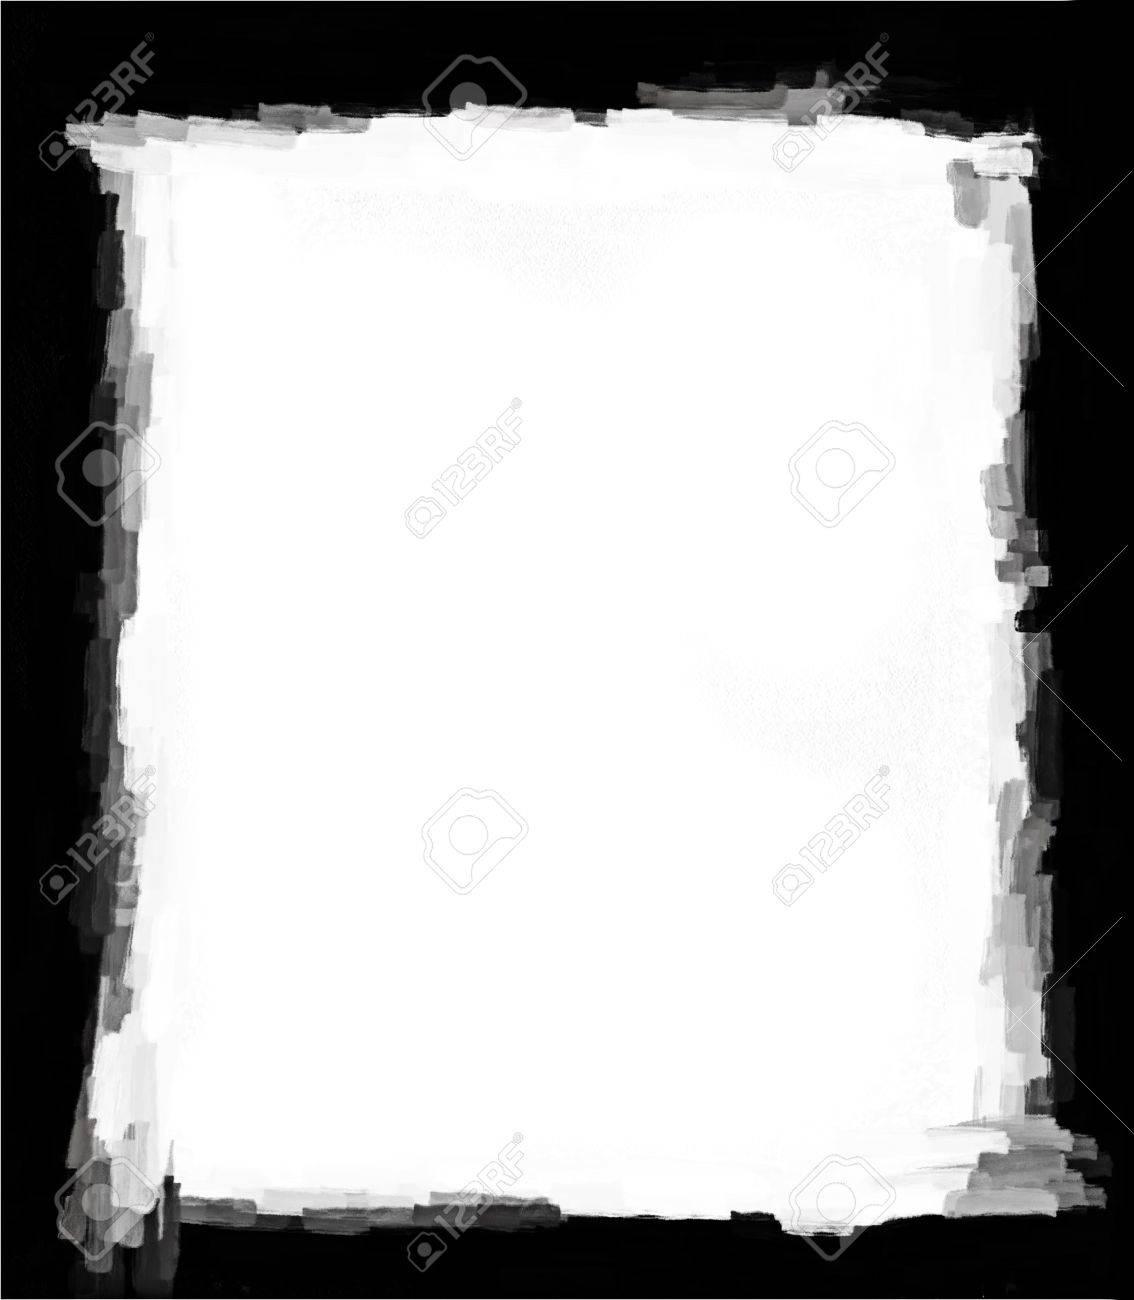 Computer designed grunge border or frame Stock Photo - 17517534